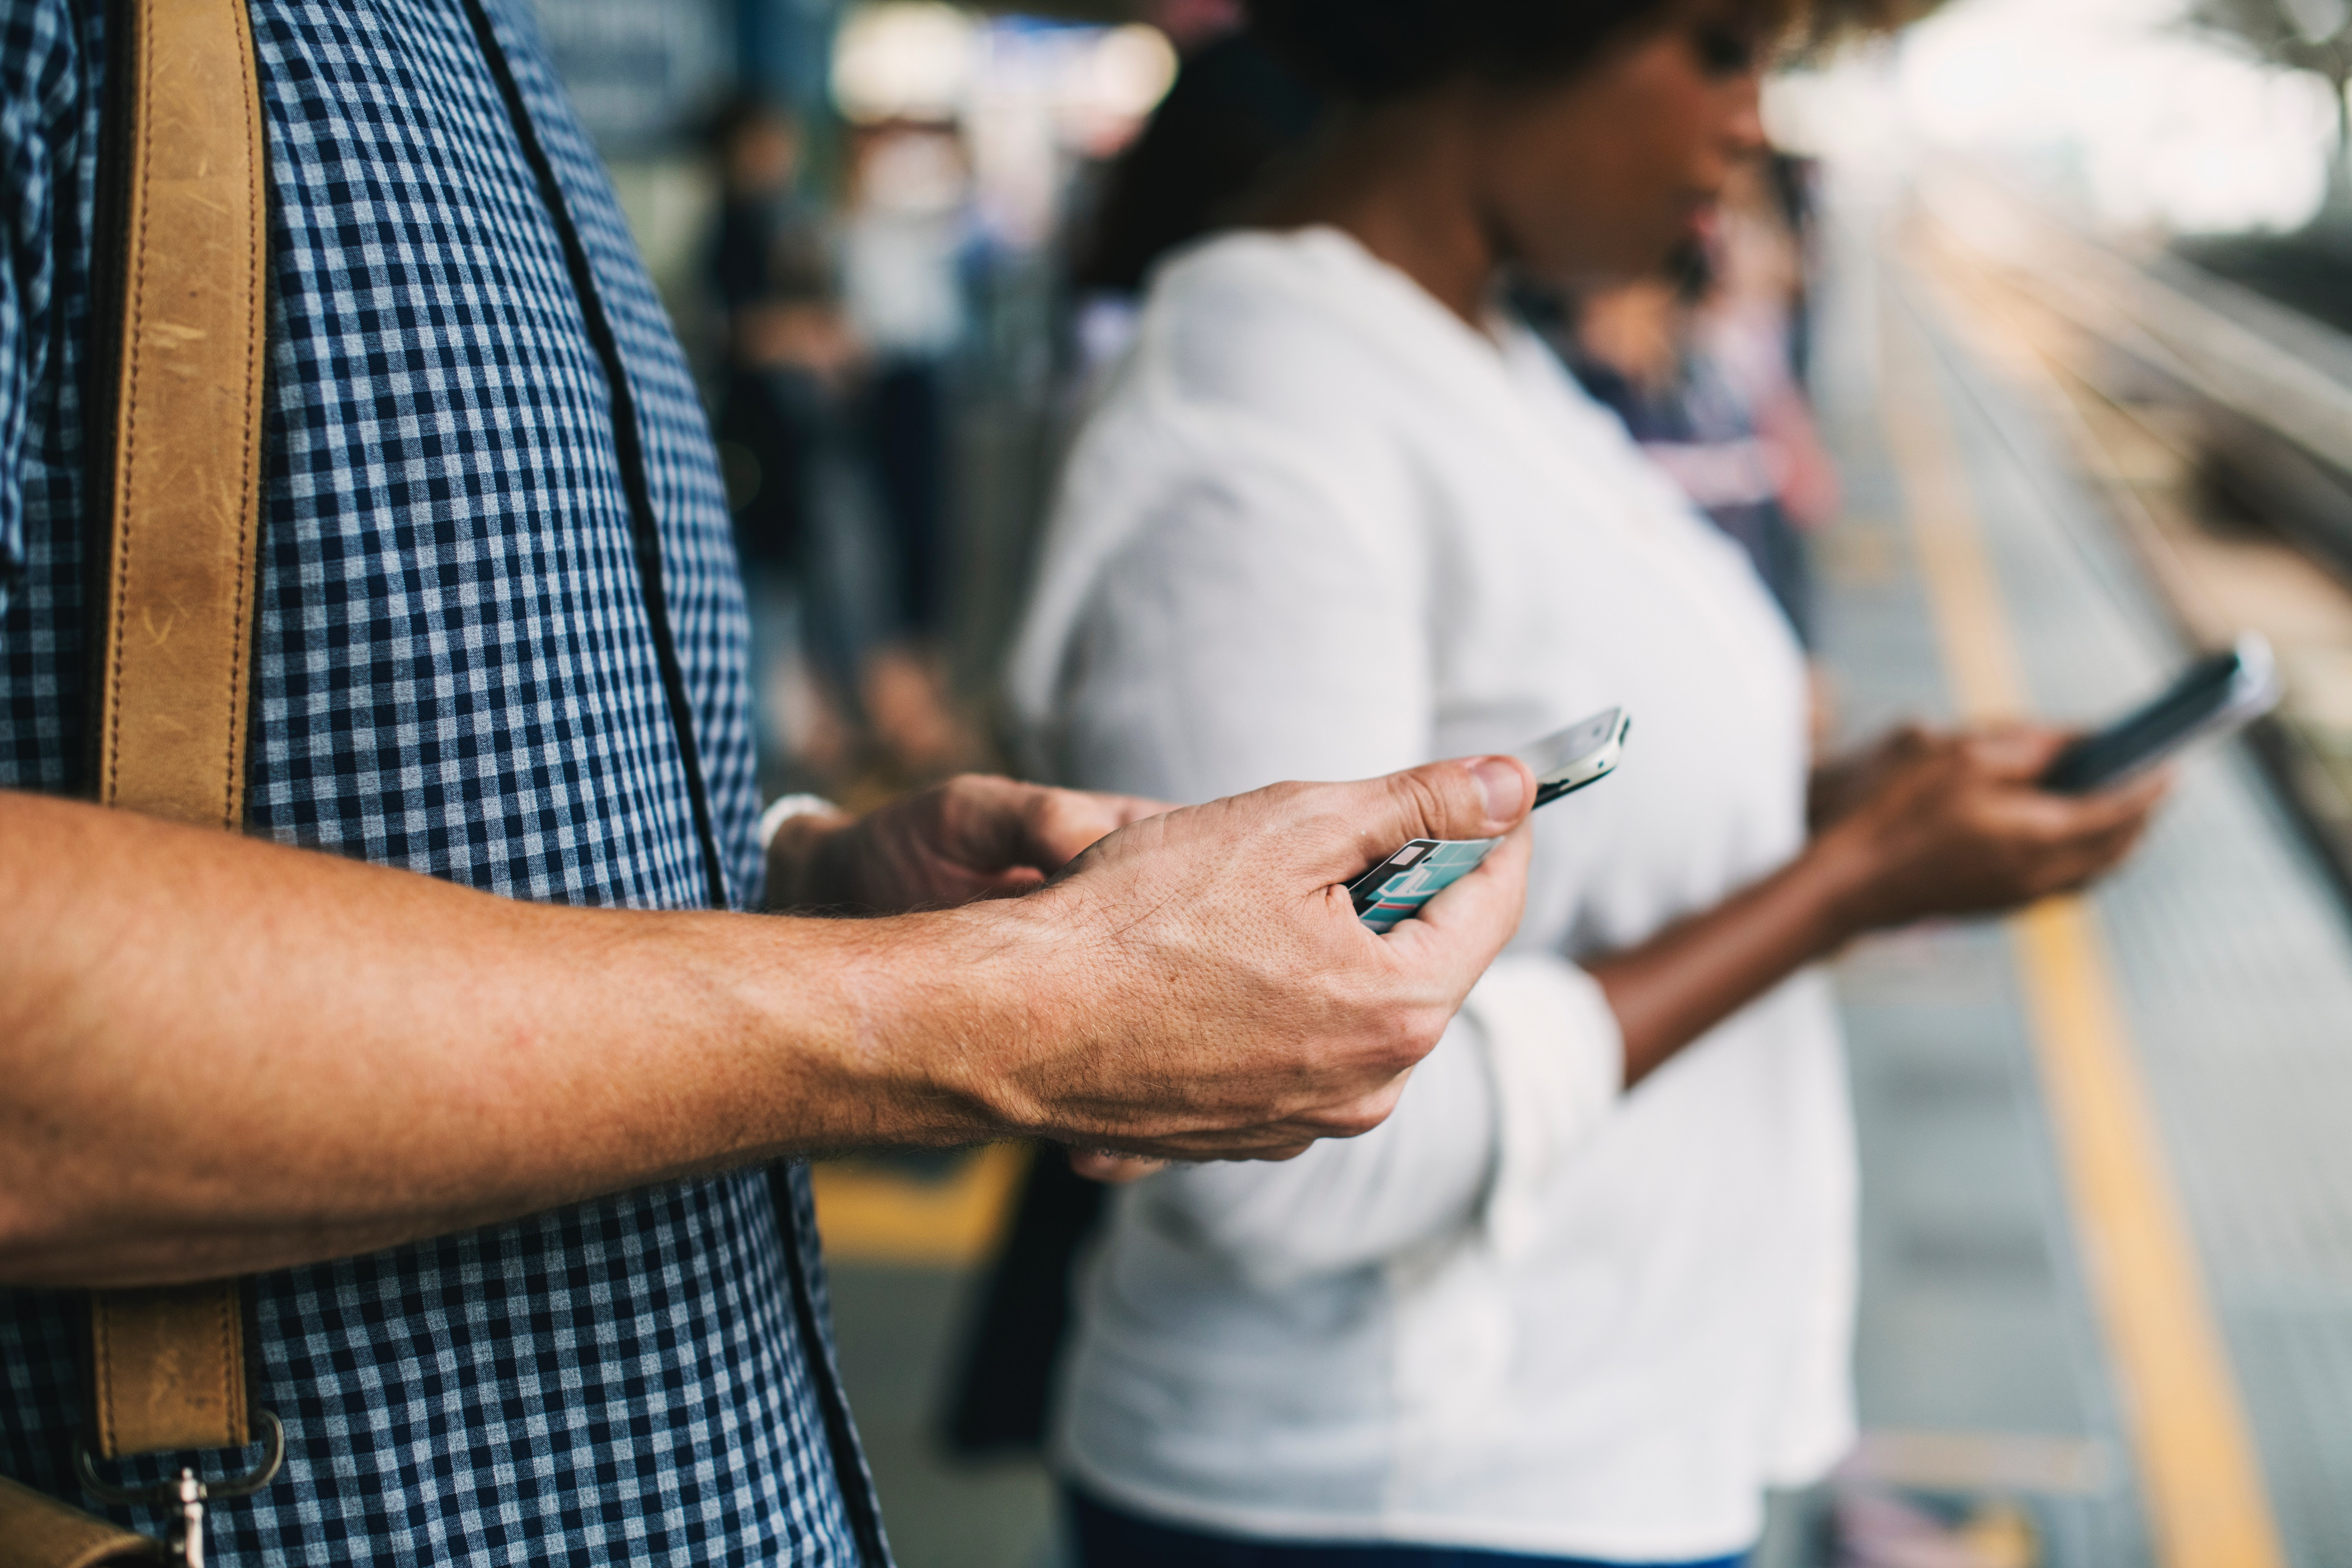 Two people look at their phones.